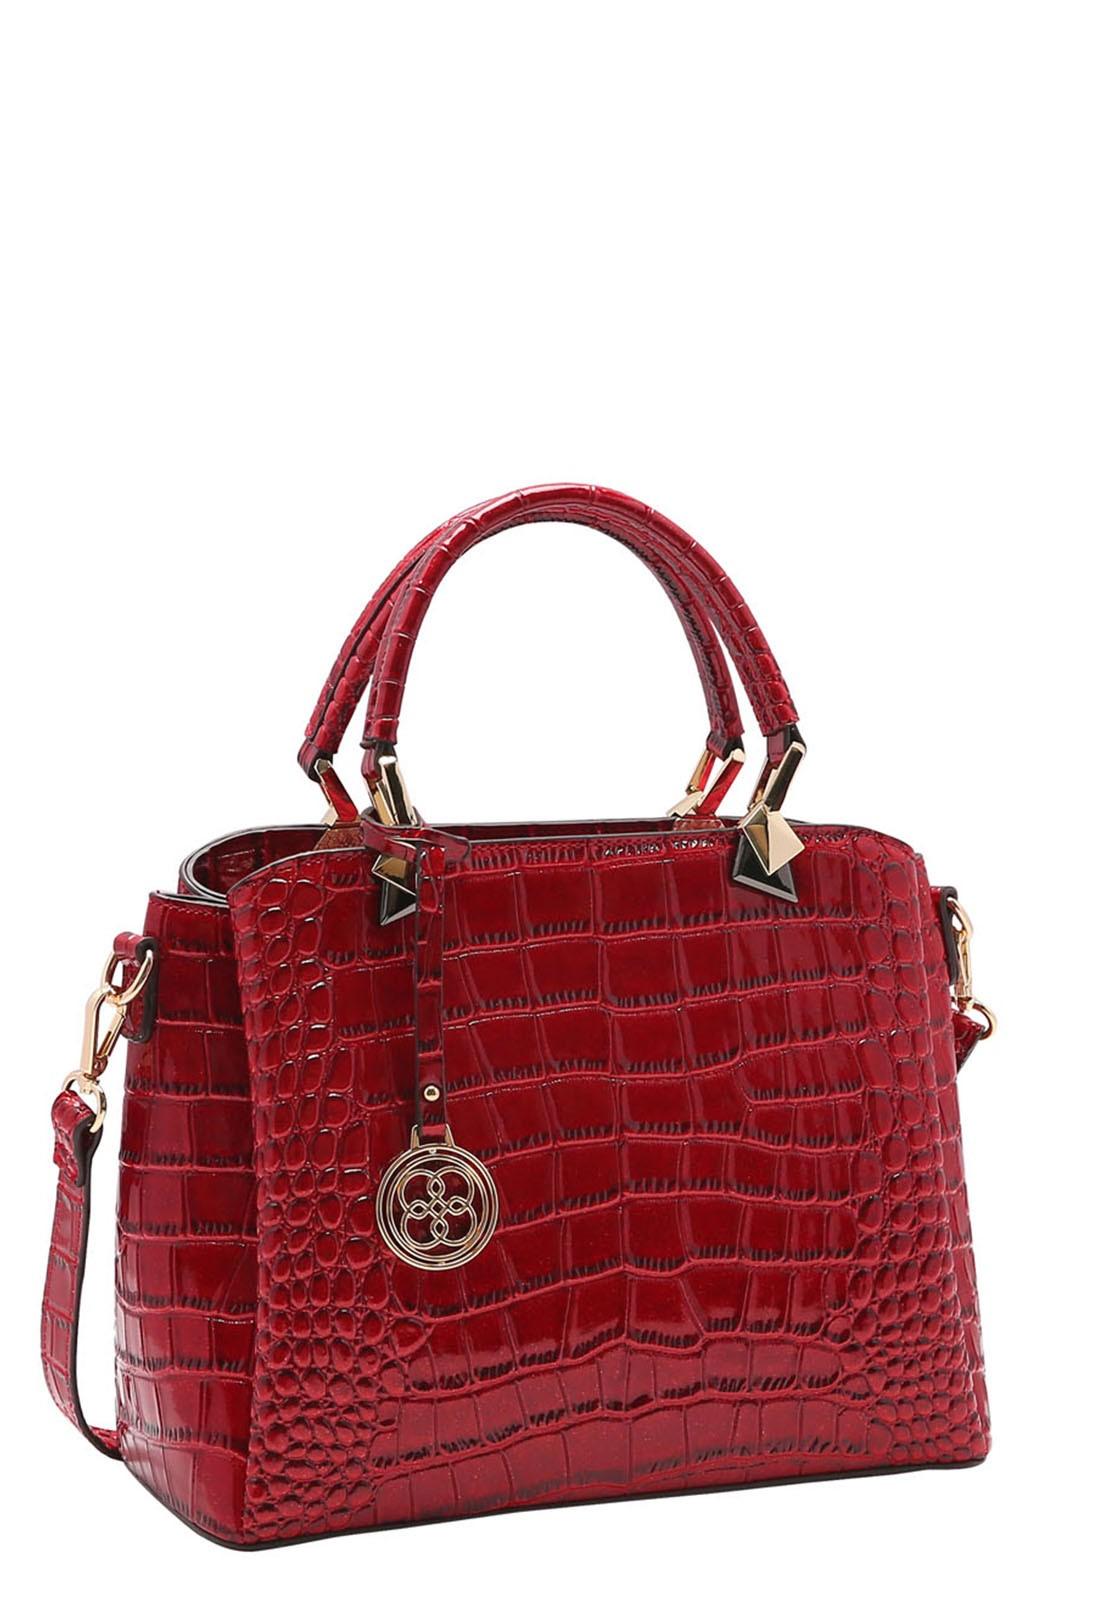 Bolsa Feminina Chenson Croco Gliter de Mão 3483195